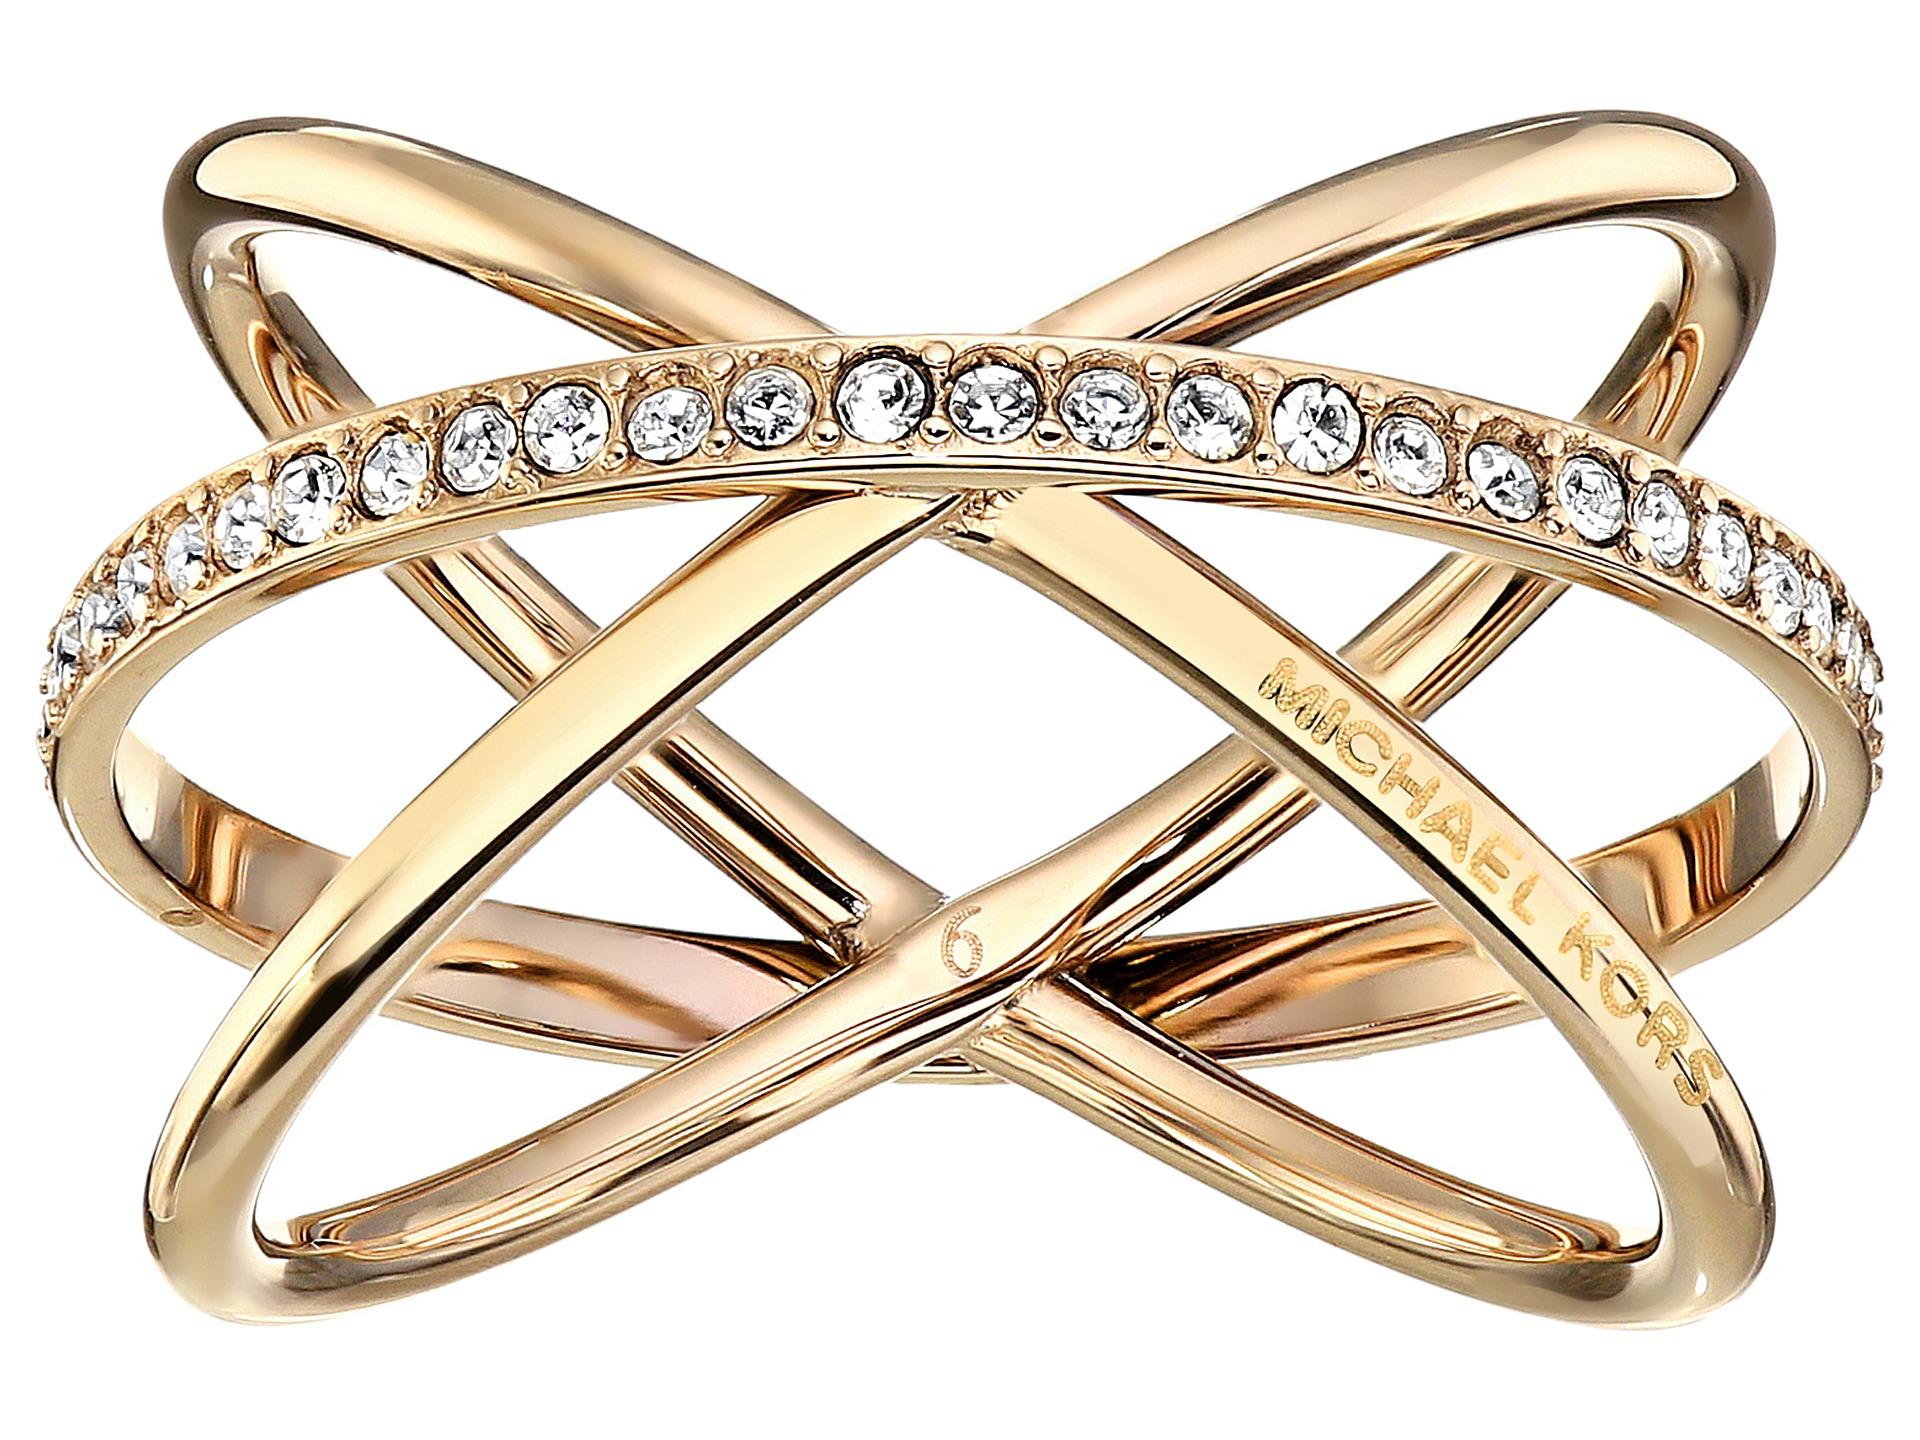 michael kors brilliance criss cross ring gold clear 1. Black Bedroom Furniture Sets. Home Design Ideas